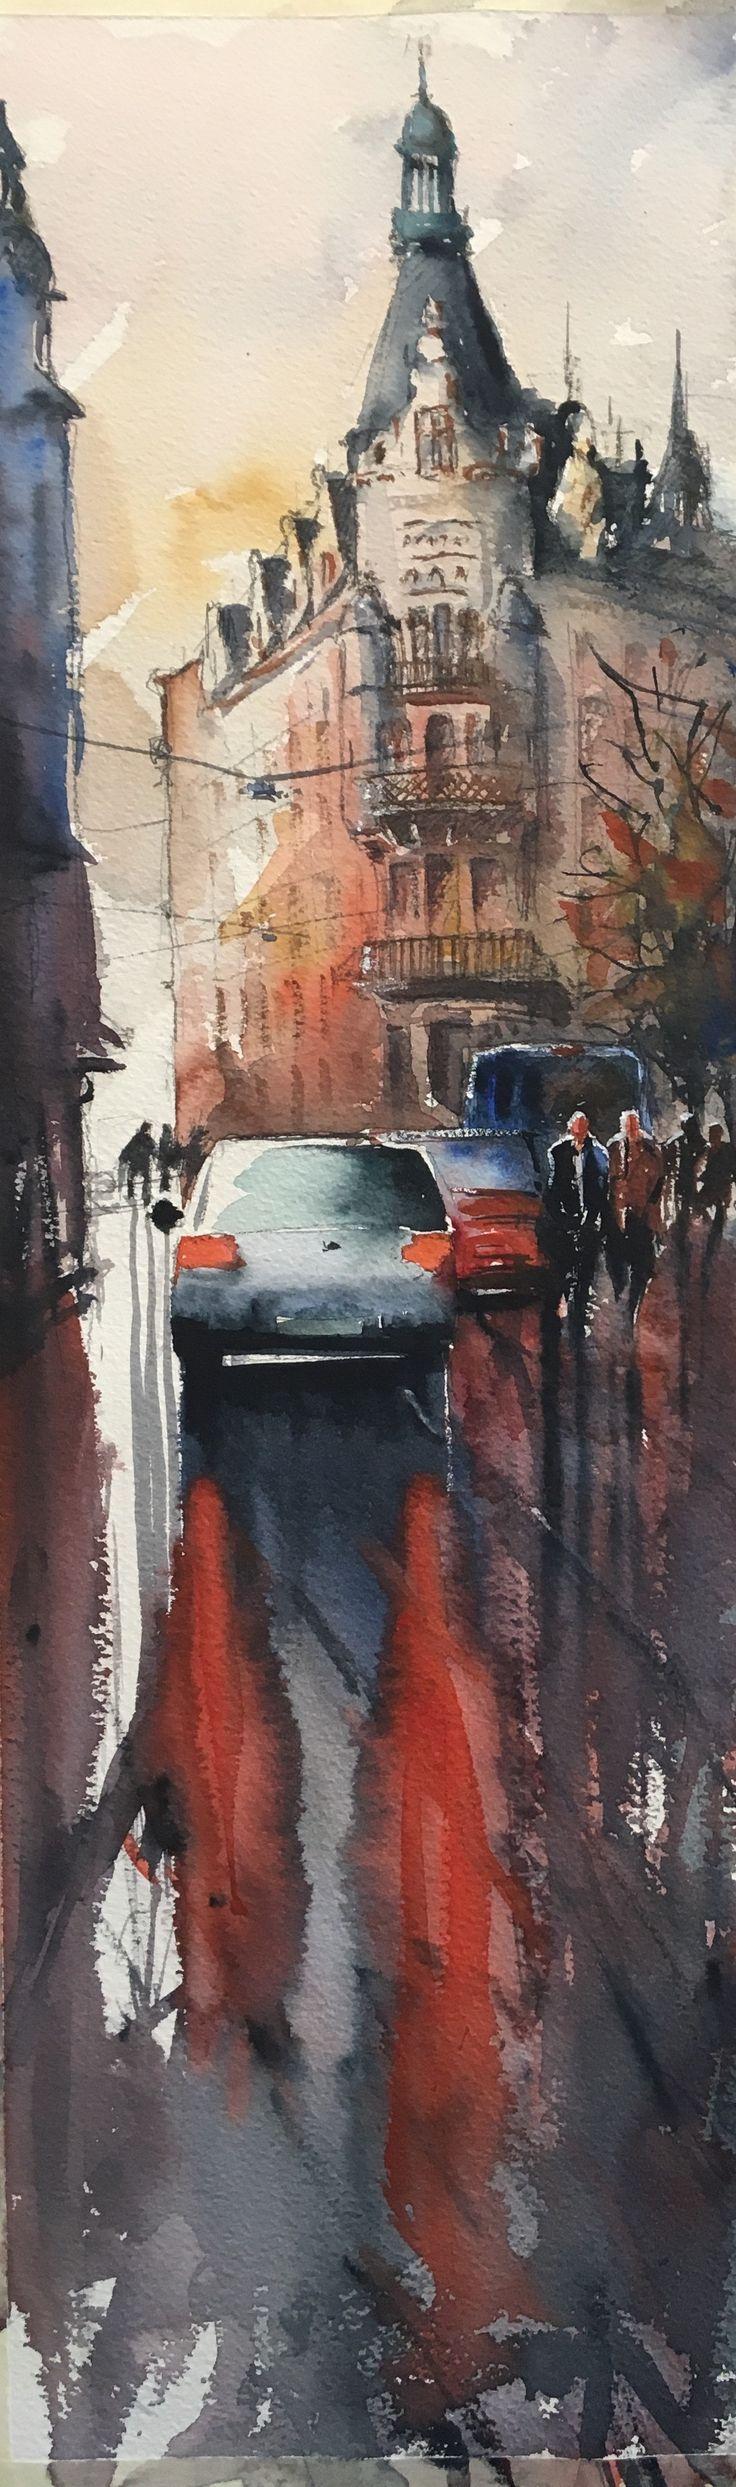 After the rain, watercolor, Stefan Gadnell